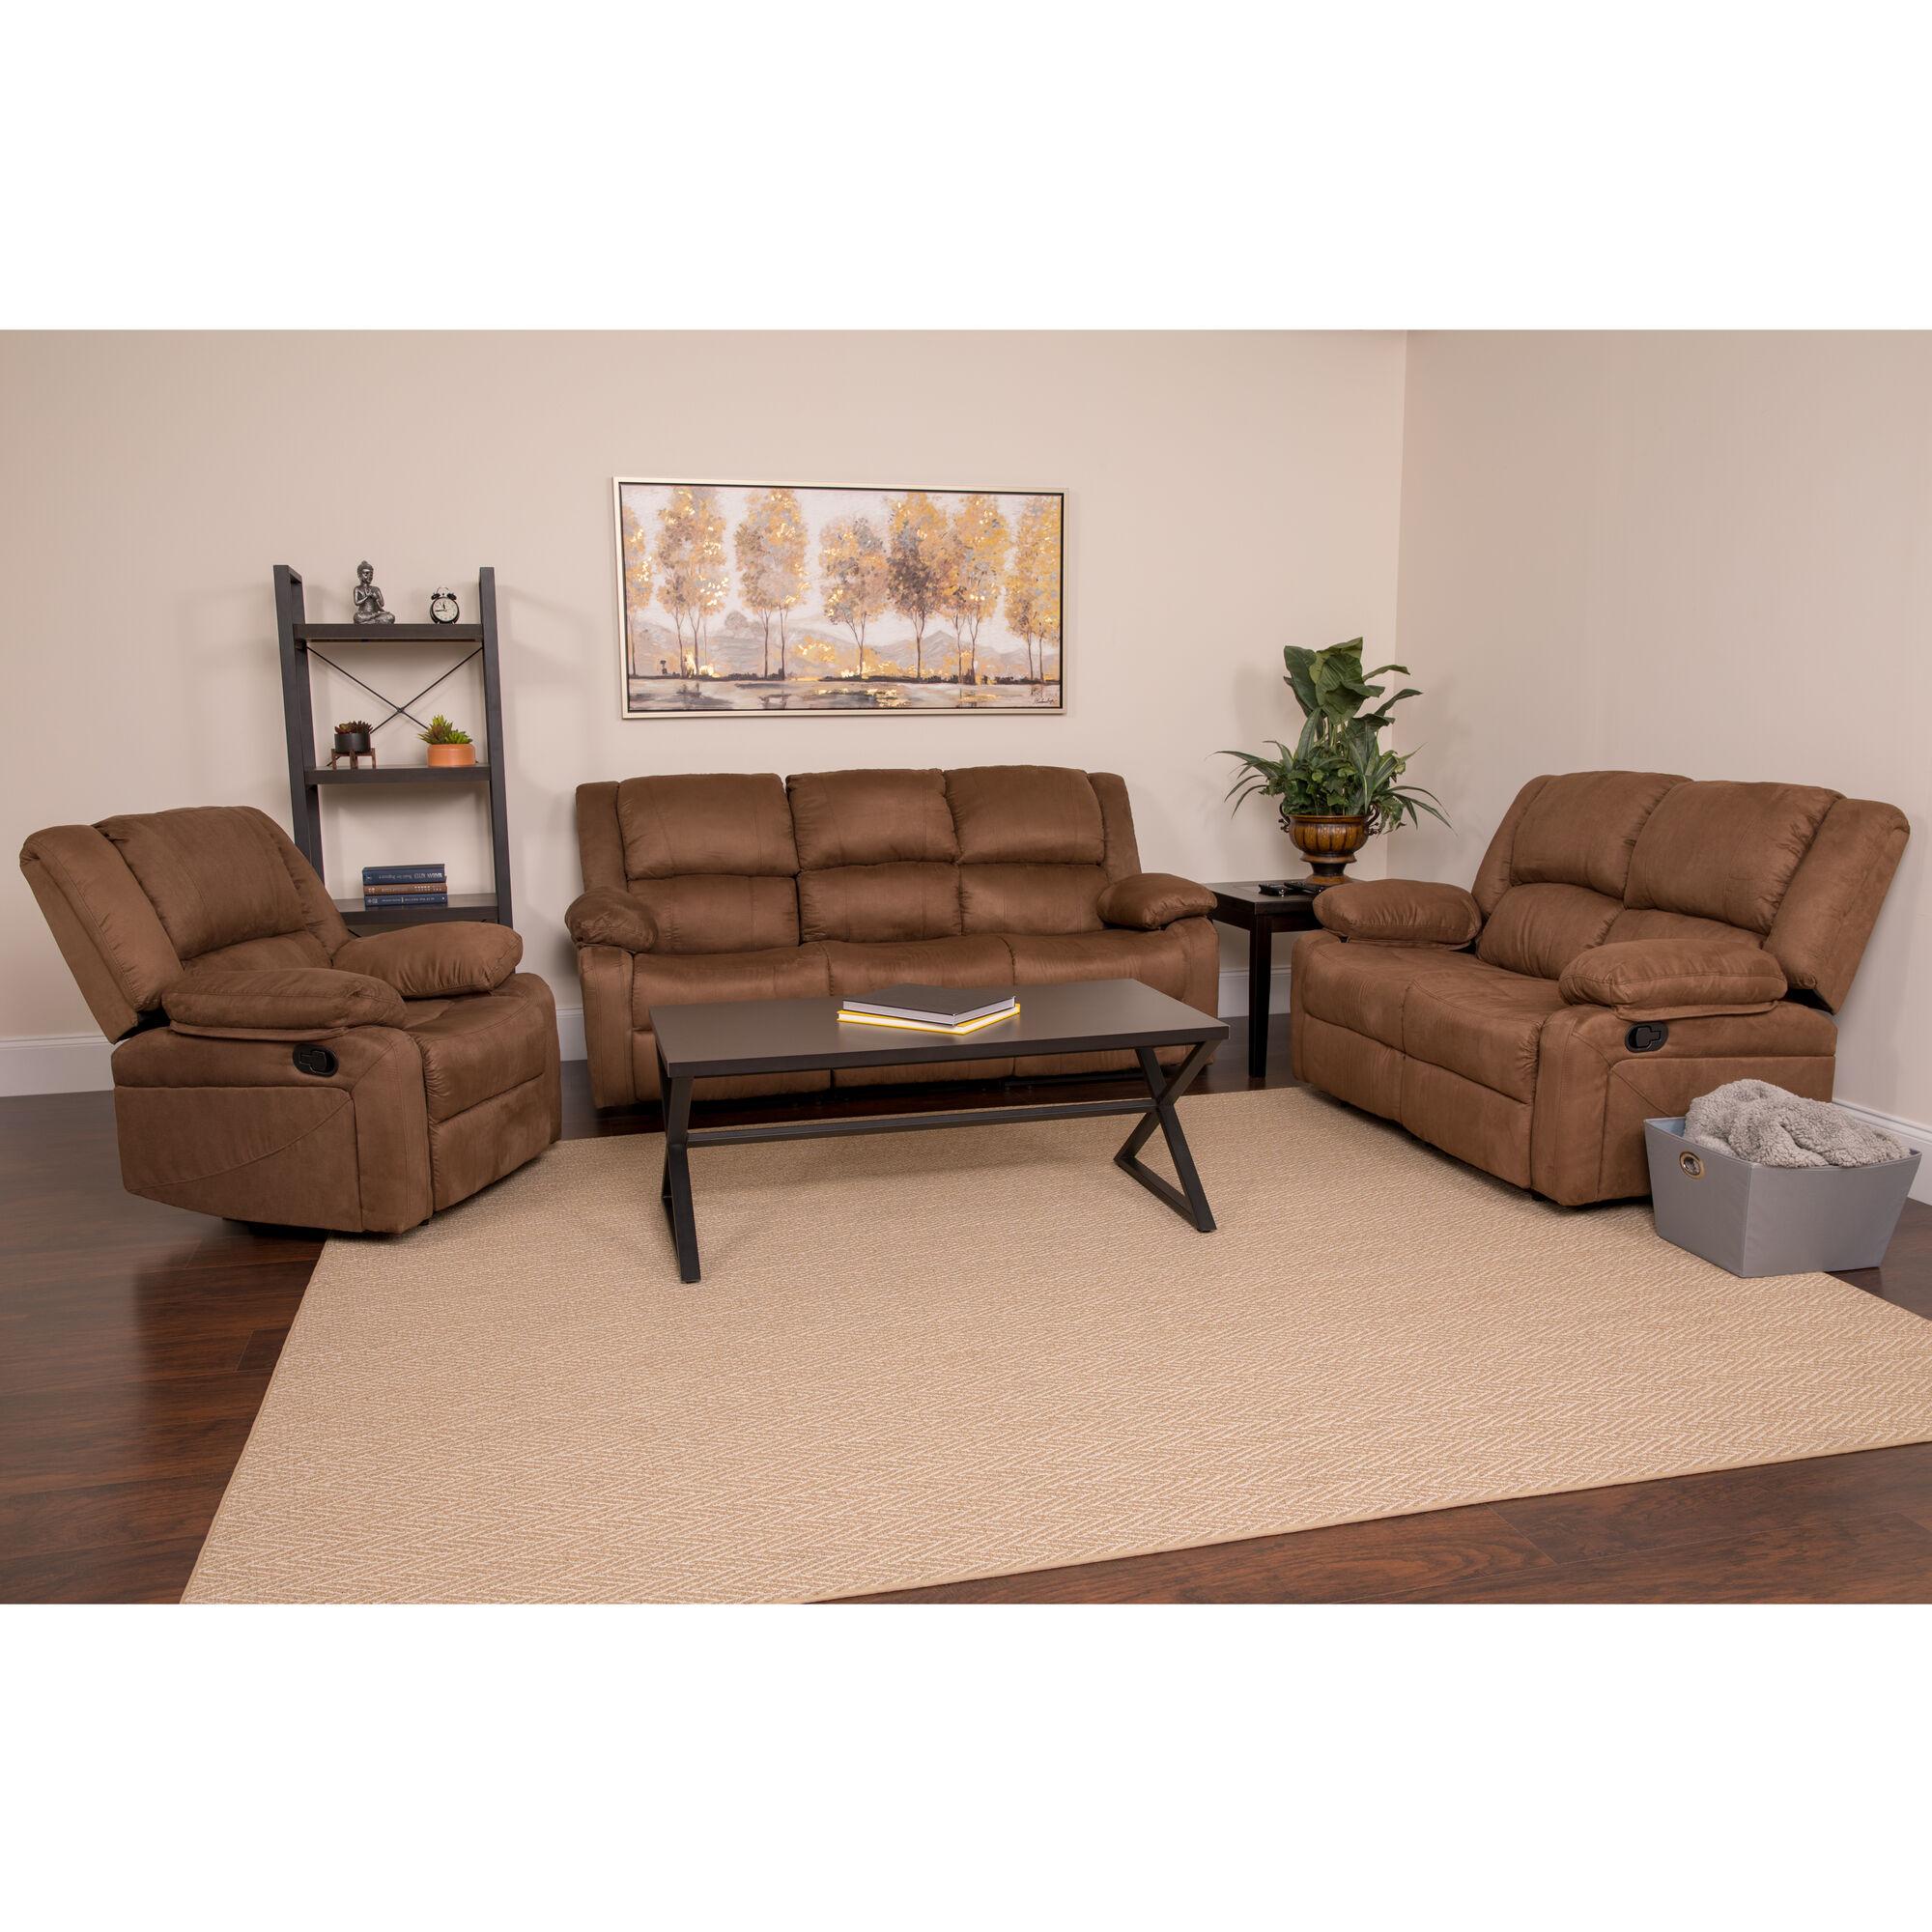 Admirable Harmony Series Chocolate Brown Microfiber Reclining Sofa Set Ncnpc Chair Design For Home Ncnpcorg